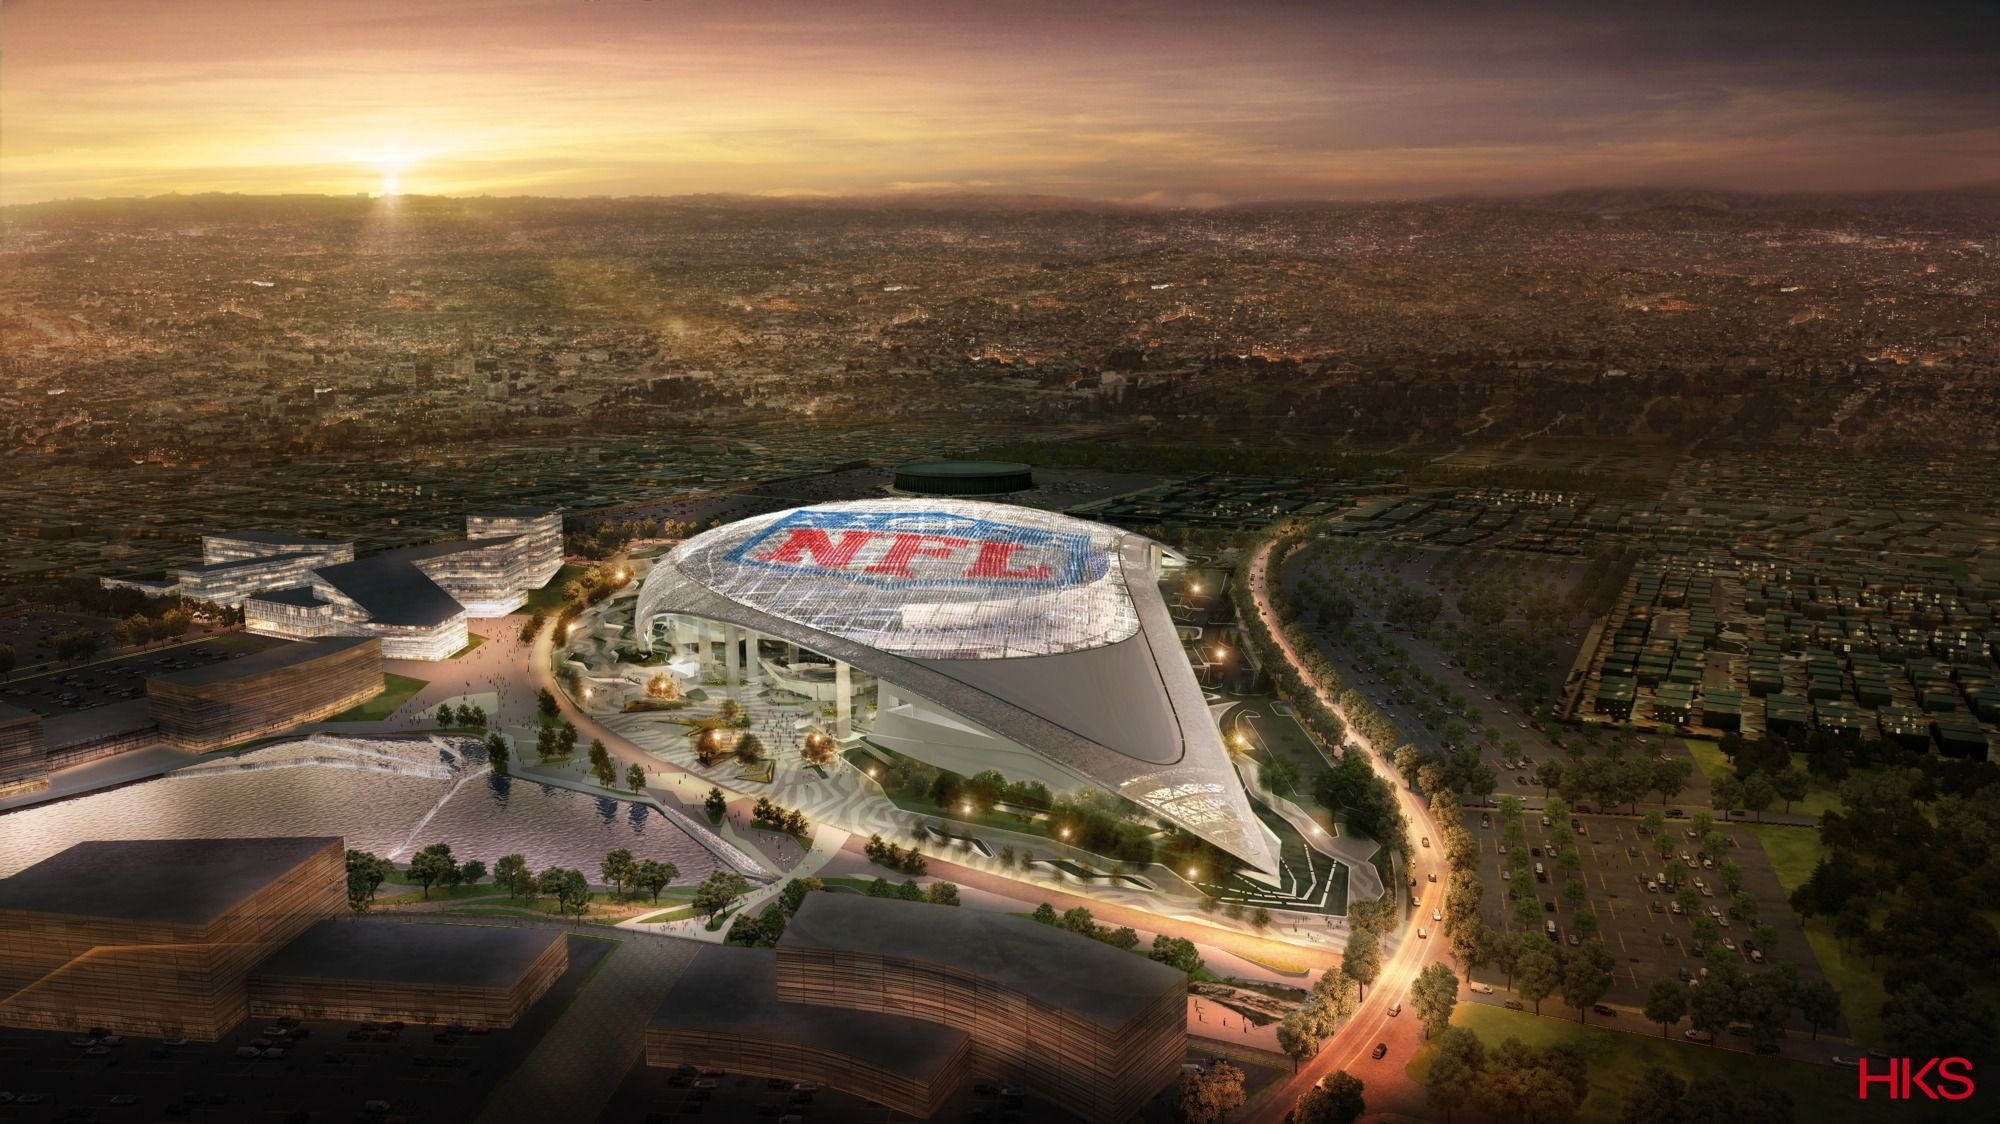 L A Stadium Hks Arch2o Com In 2020 Nfl Stadiums New Football Stadiums Los Angeles Rams